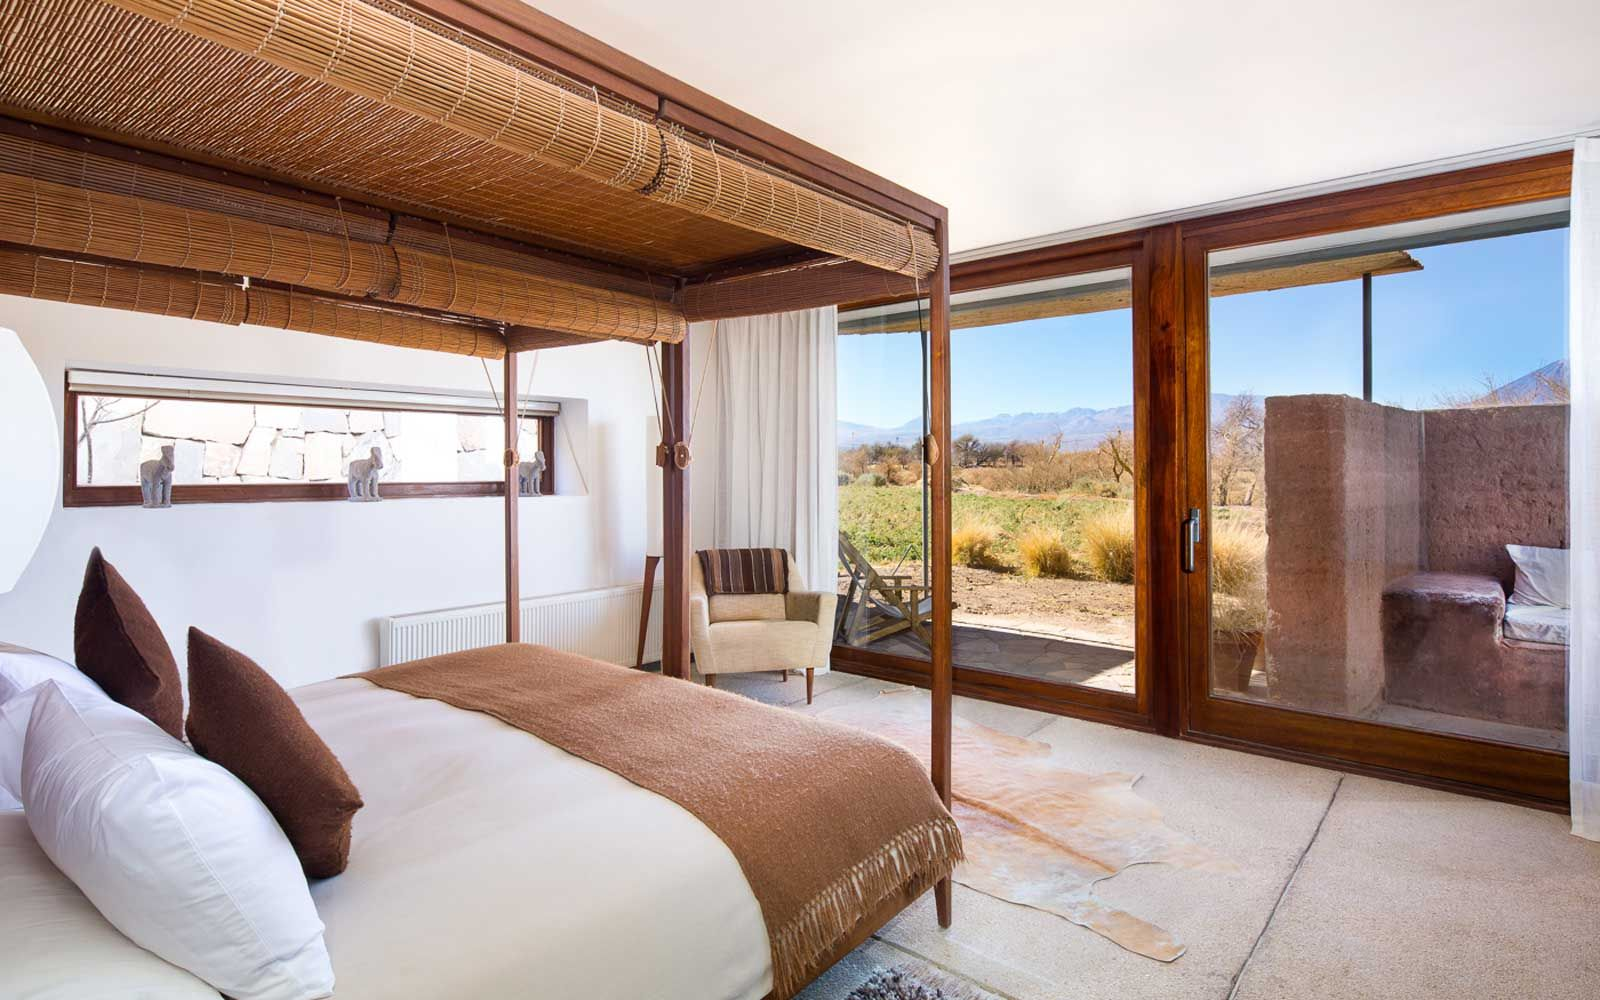 Top 10 Resort Hotels in South America   Resort rooms, Hotel, Airy room